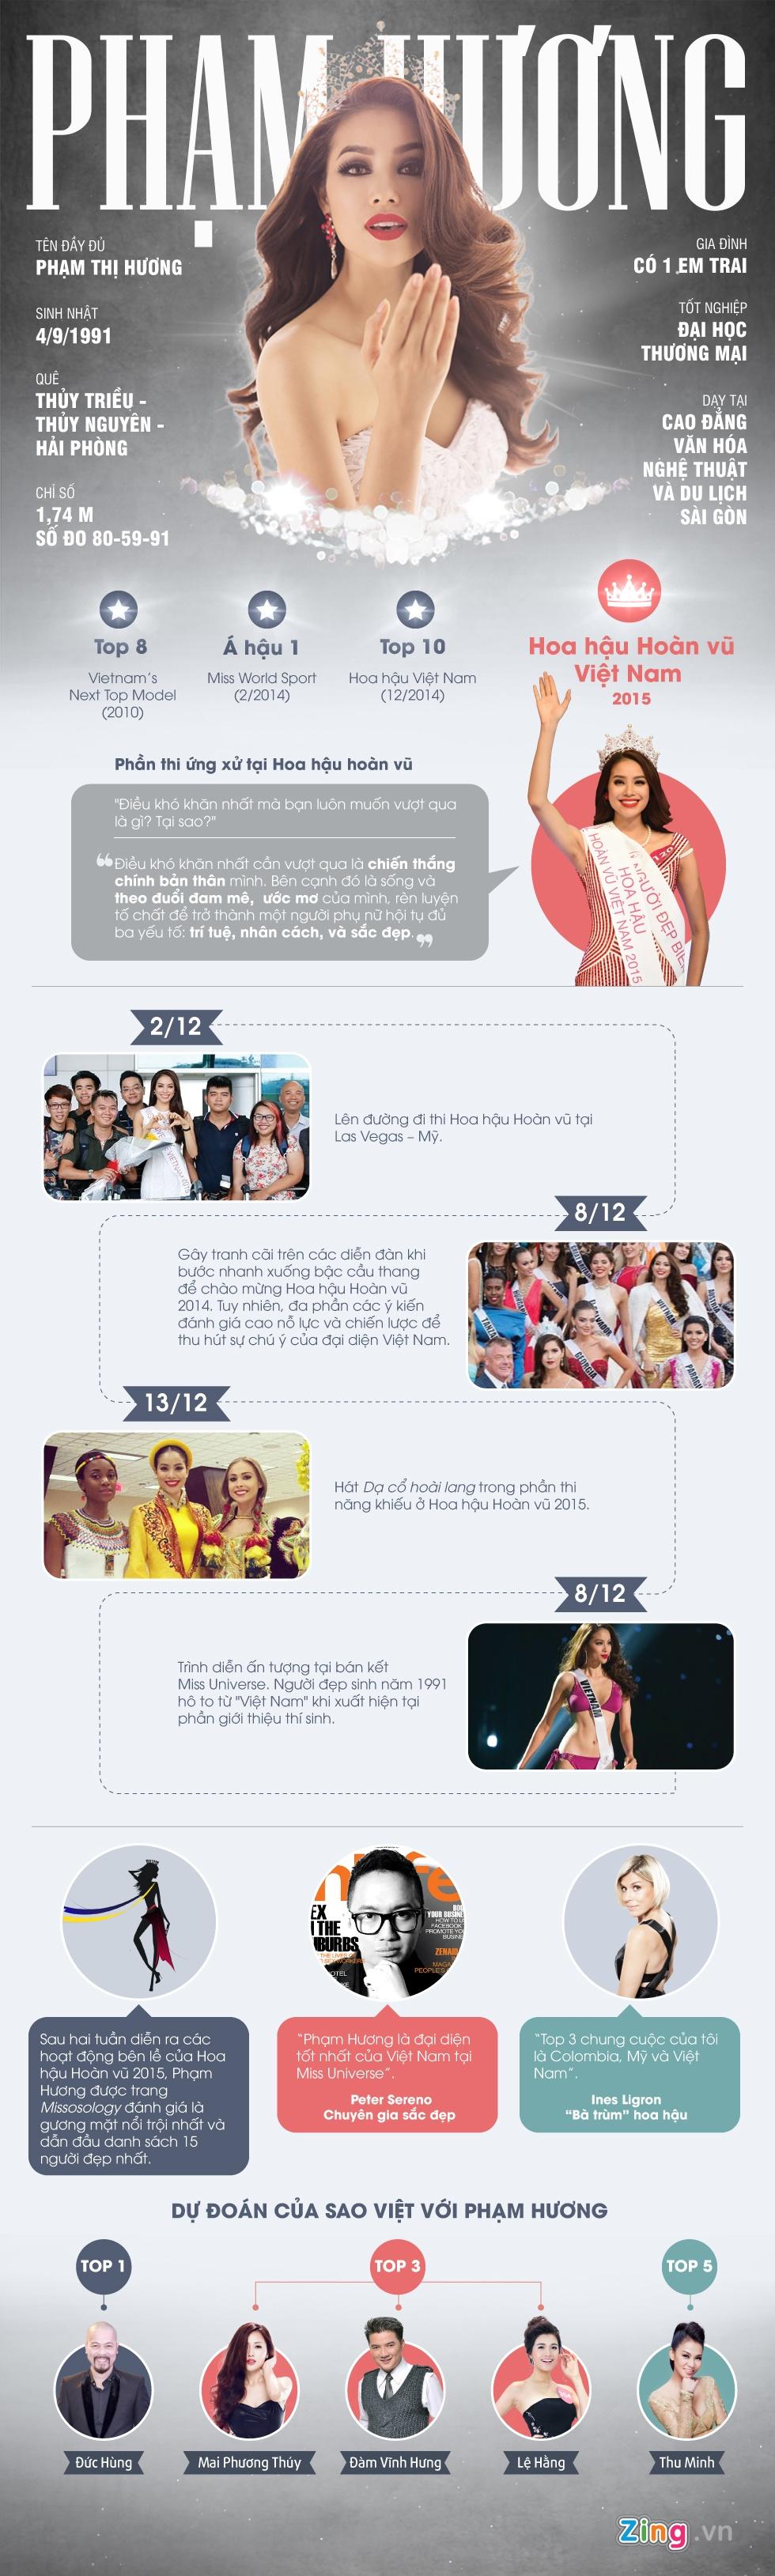 Pham Huong: My nhan cua nam 2015 hinh anh 1